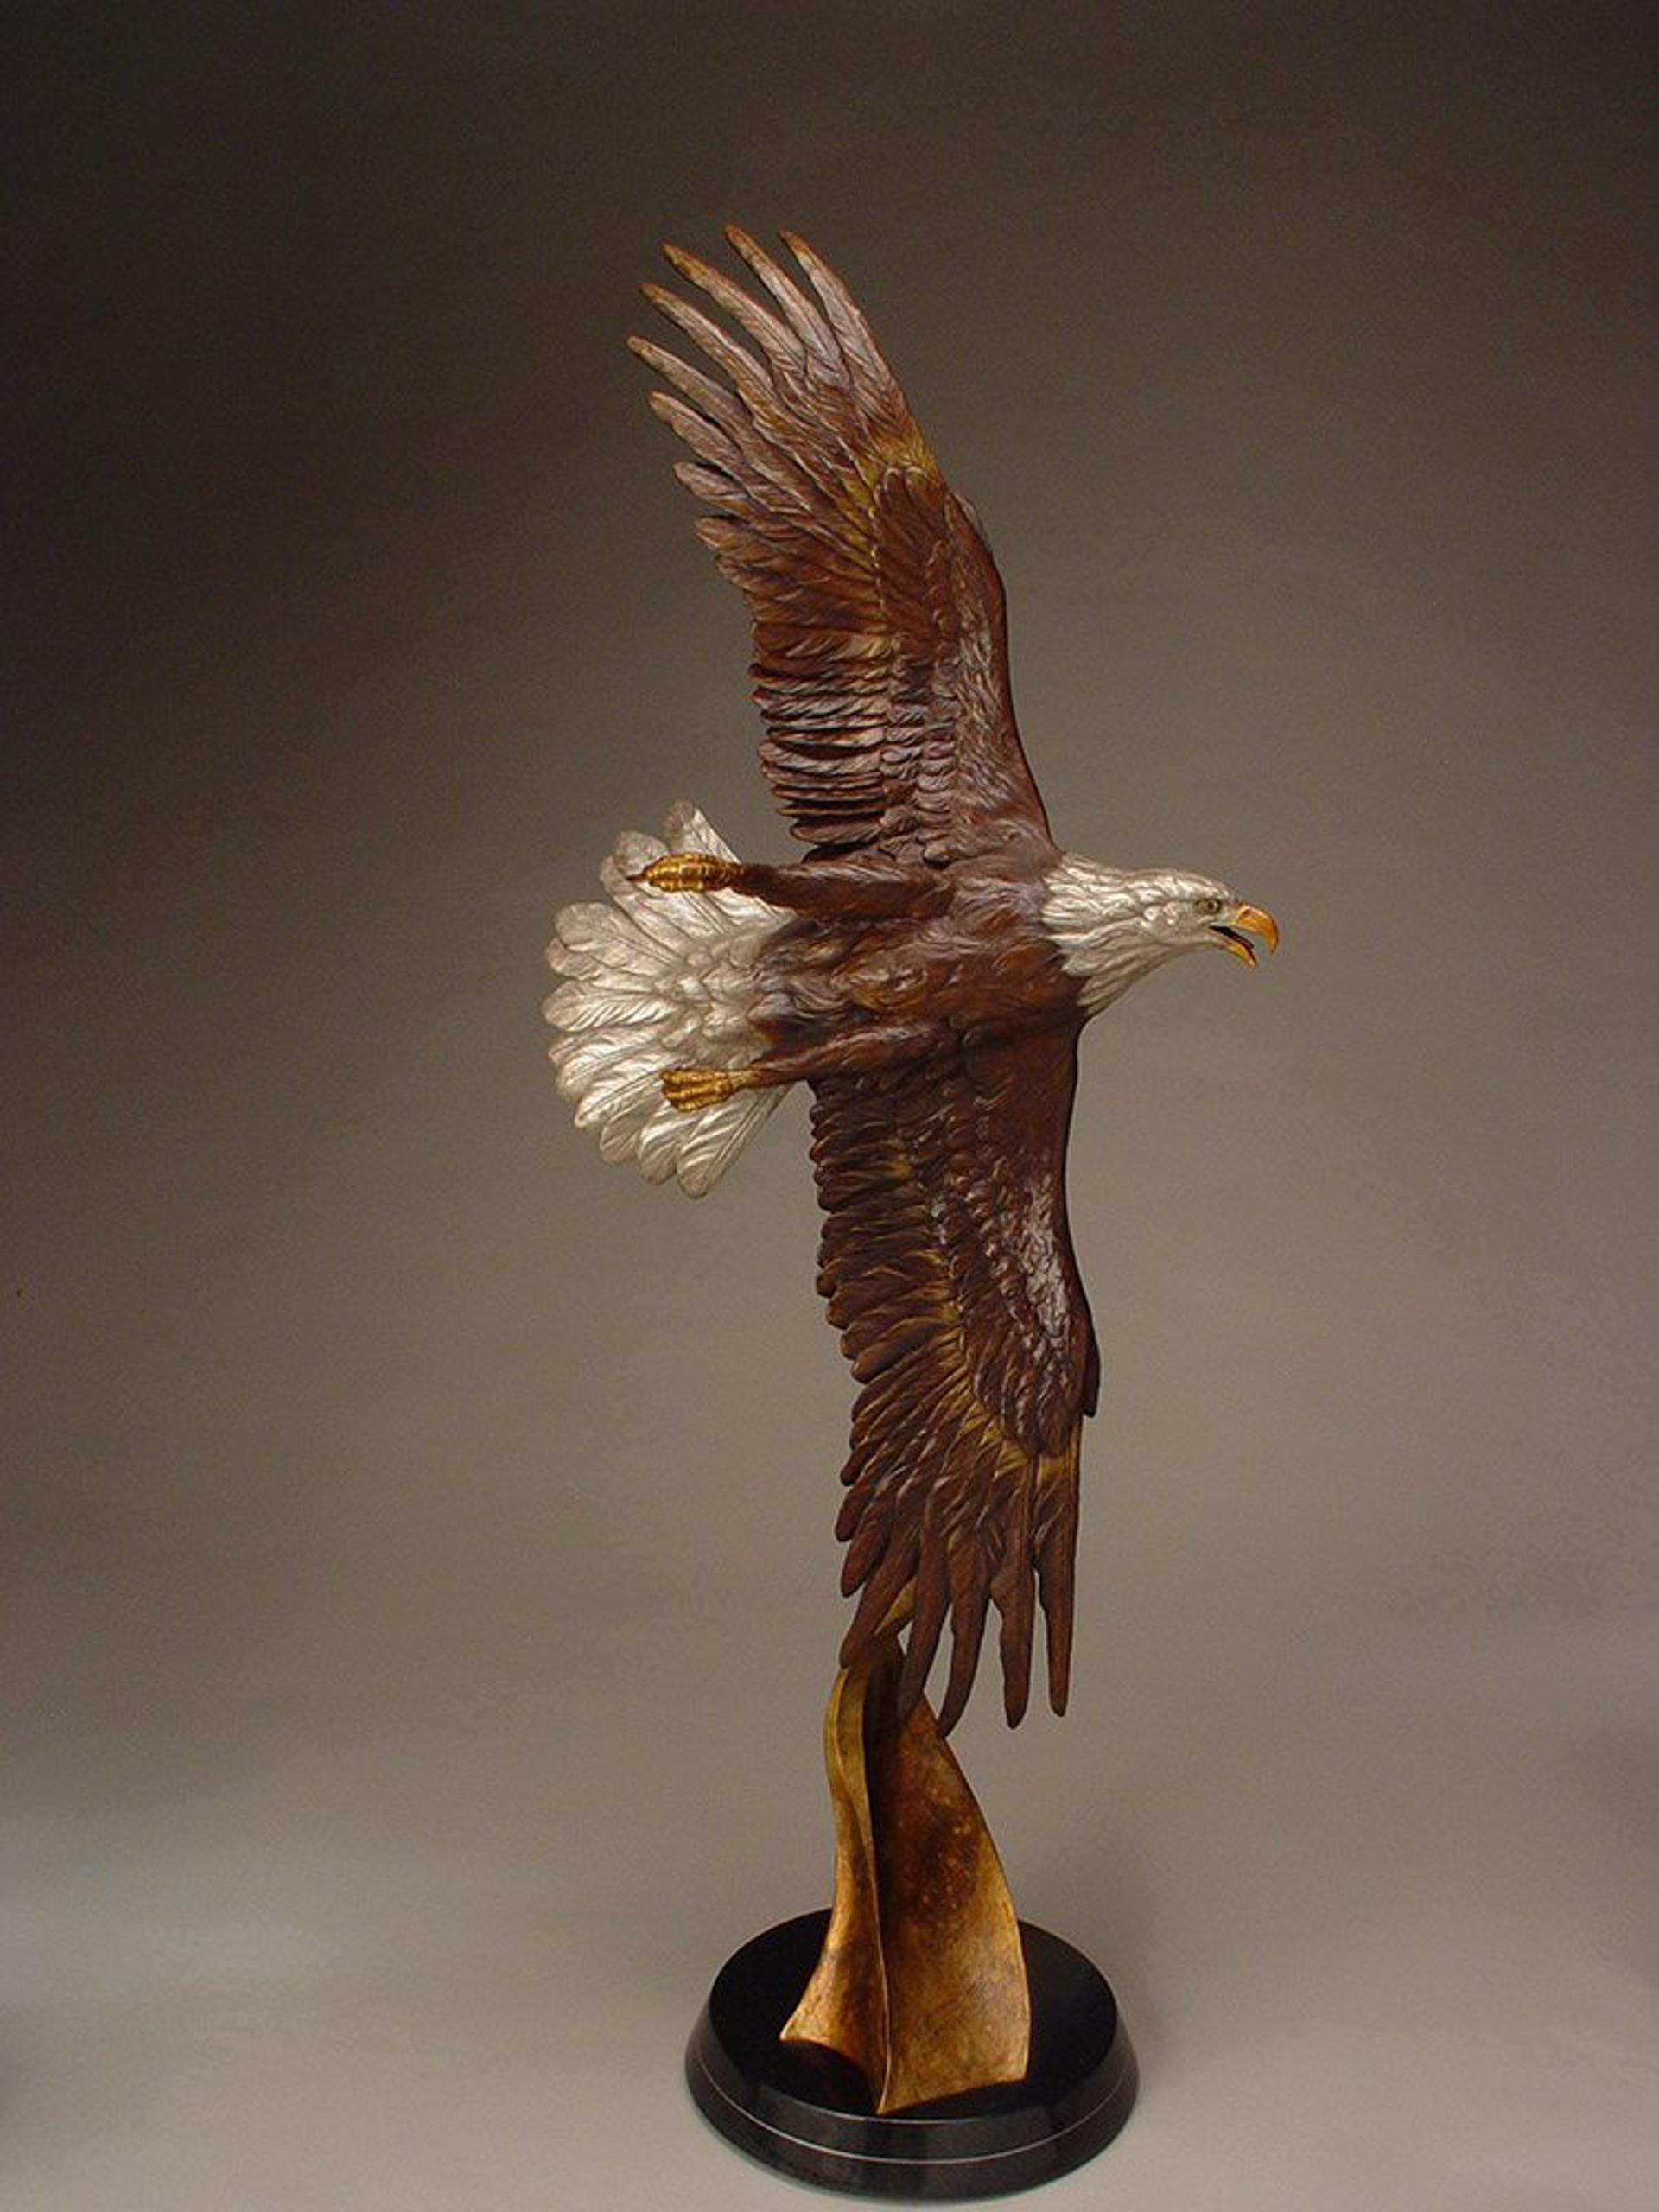 Flying Free by Eugene Morelli